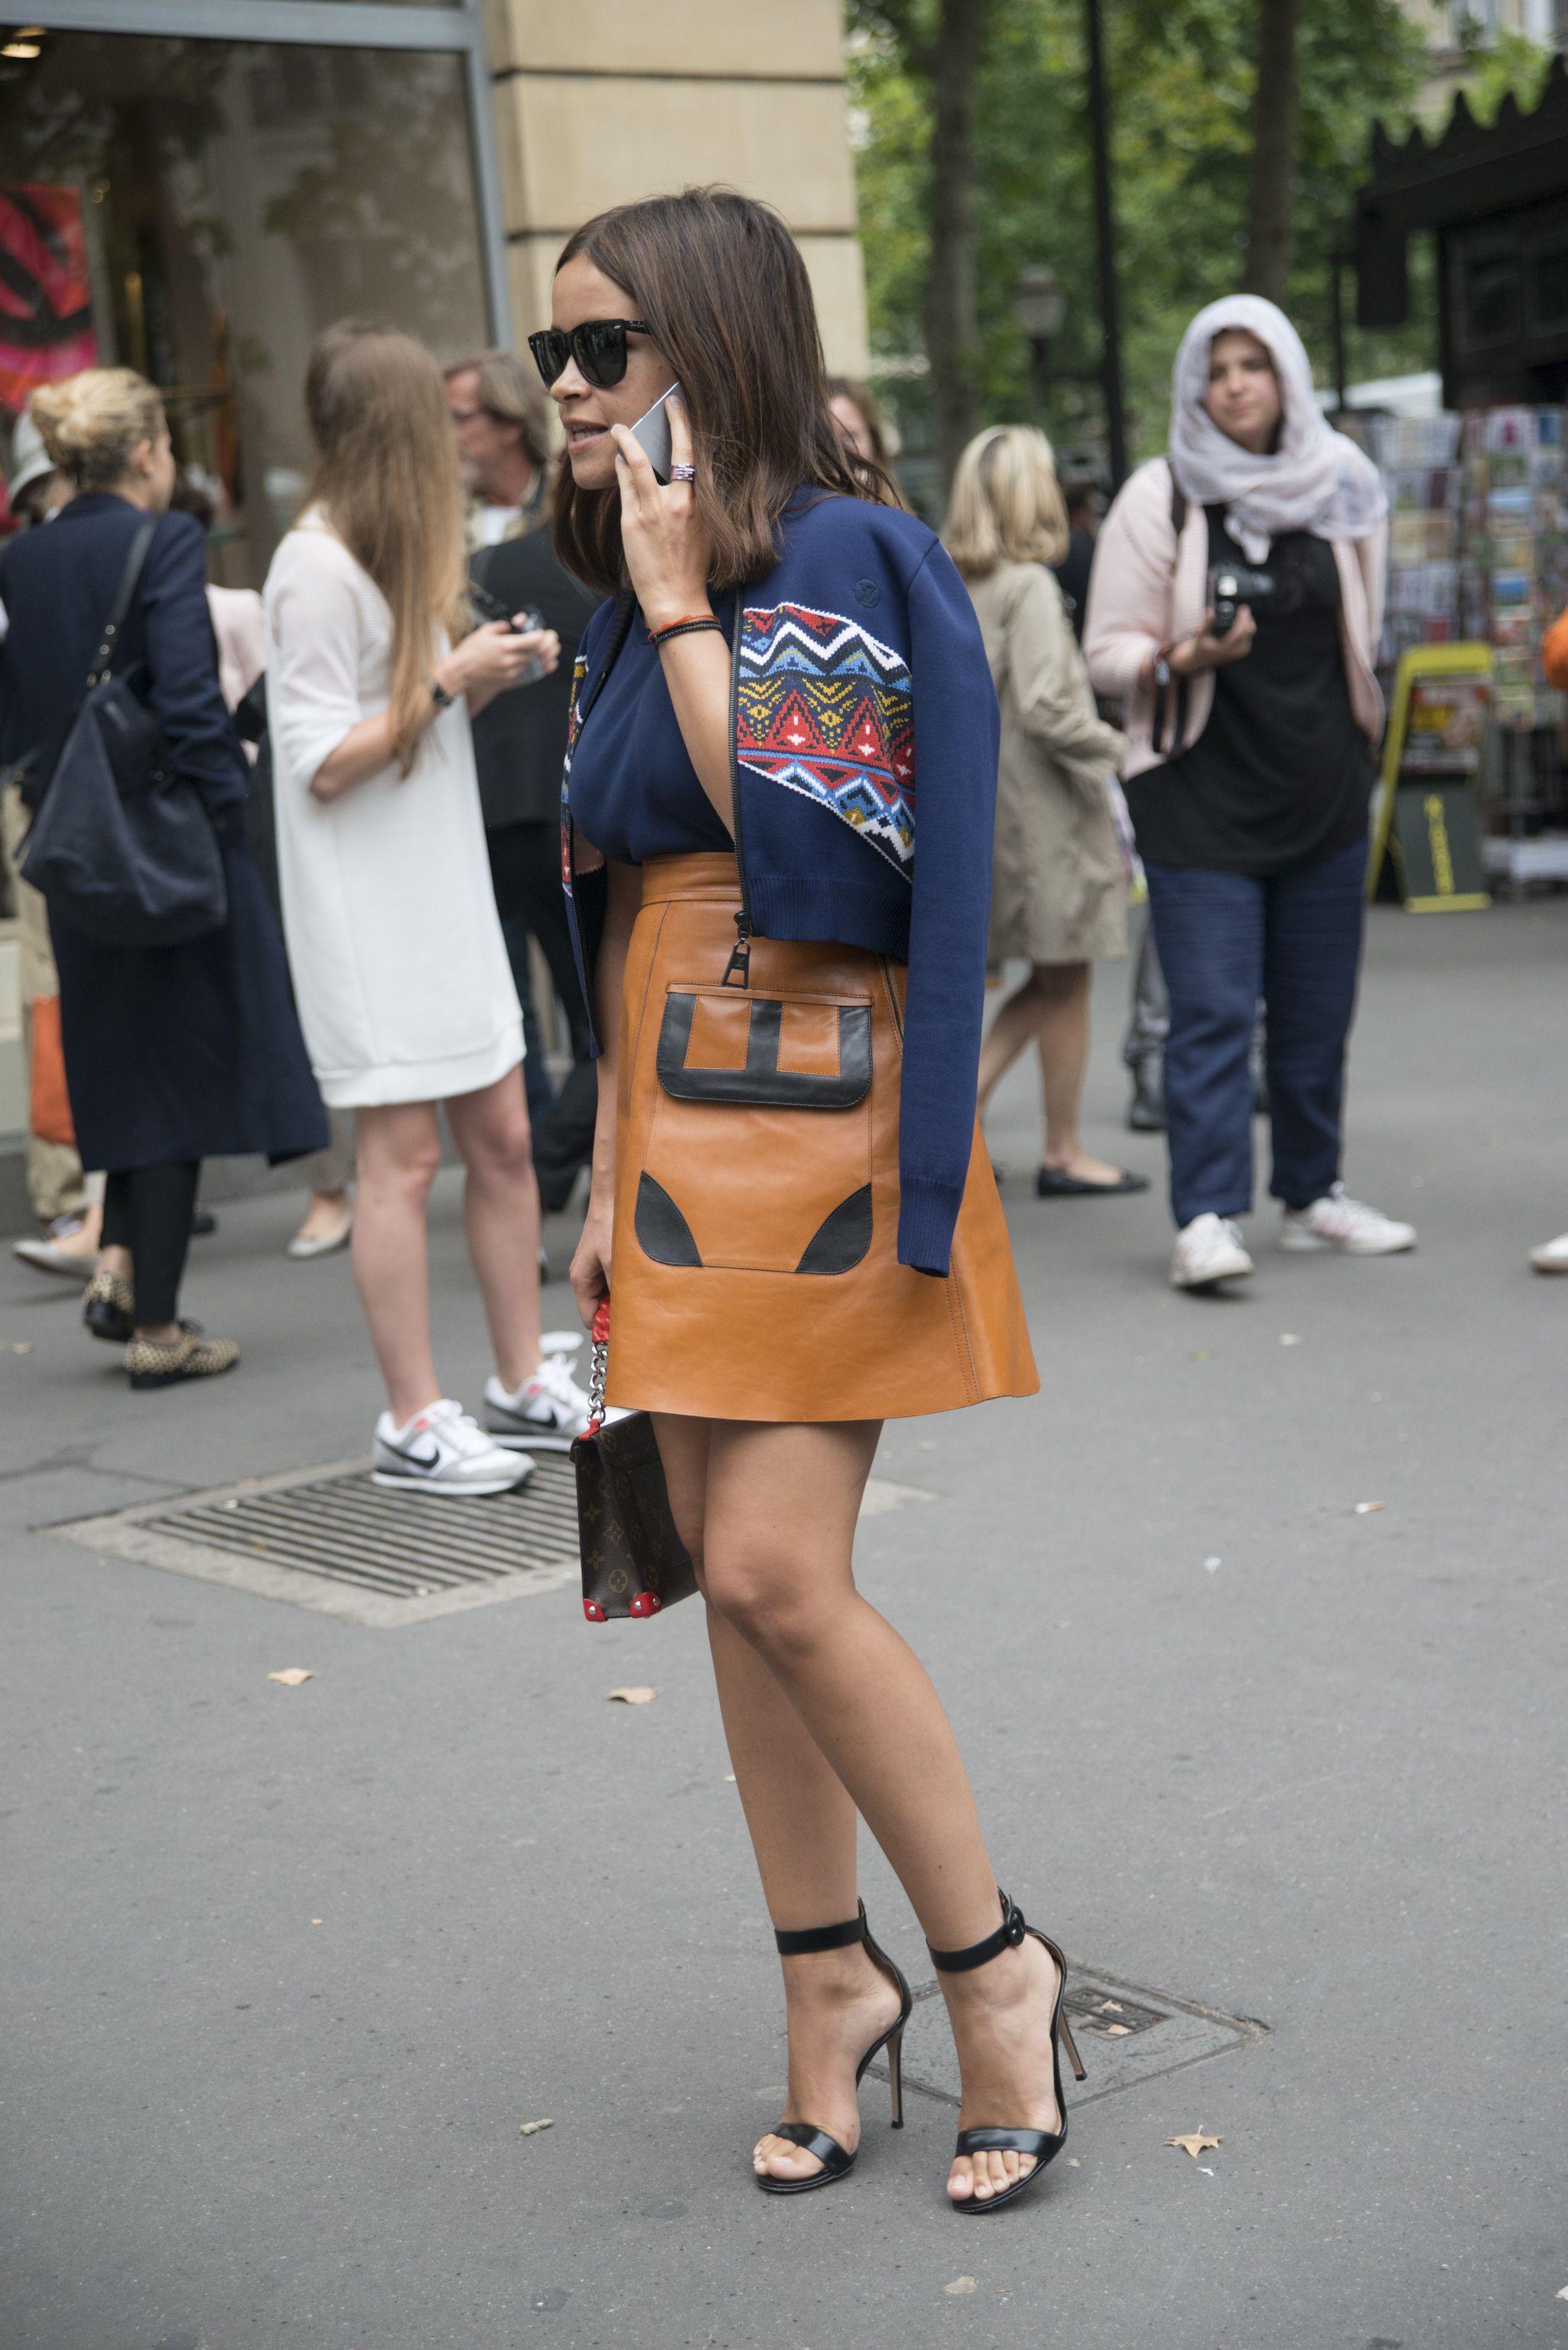 Street Style Stars Maternity & Pregnancy Style At Fashion Week | Grazia Fashion